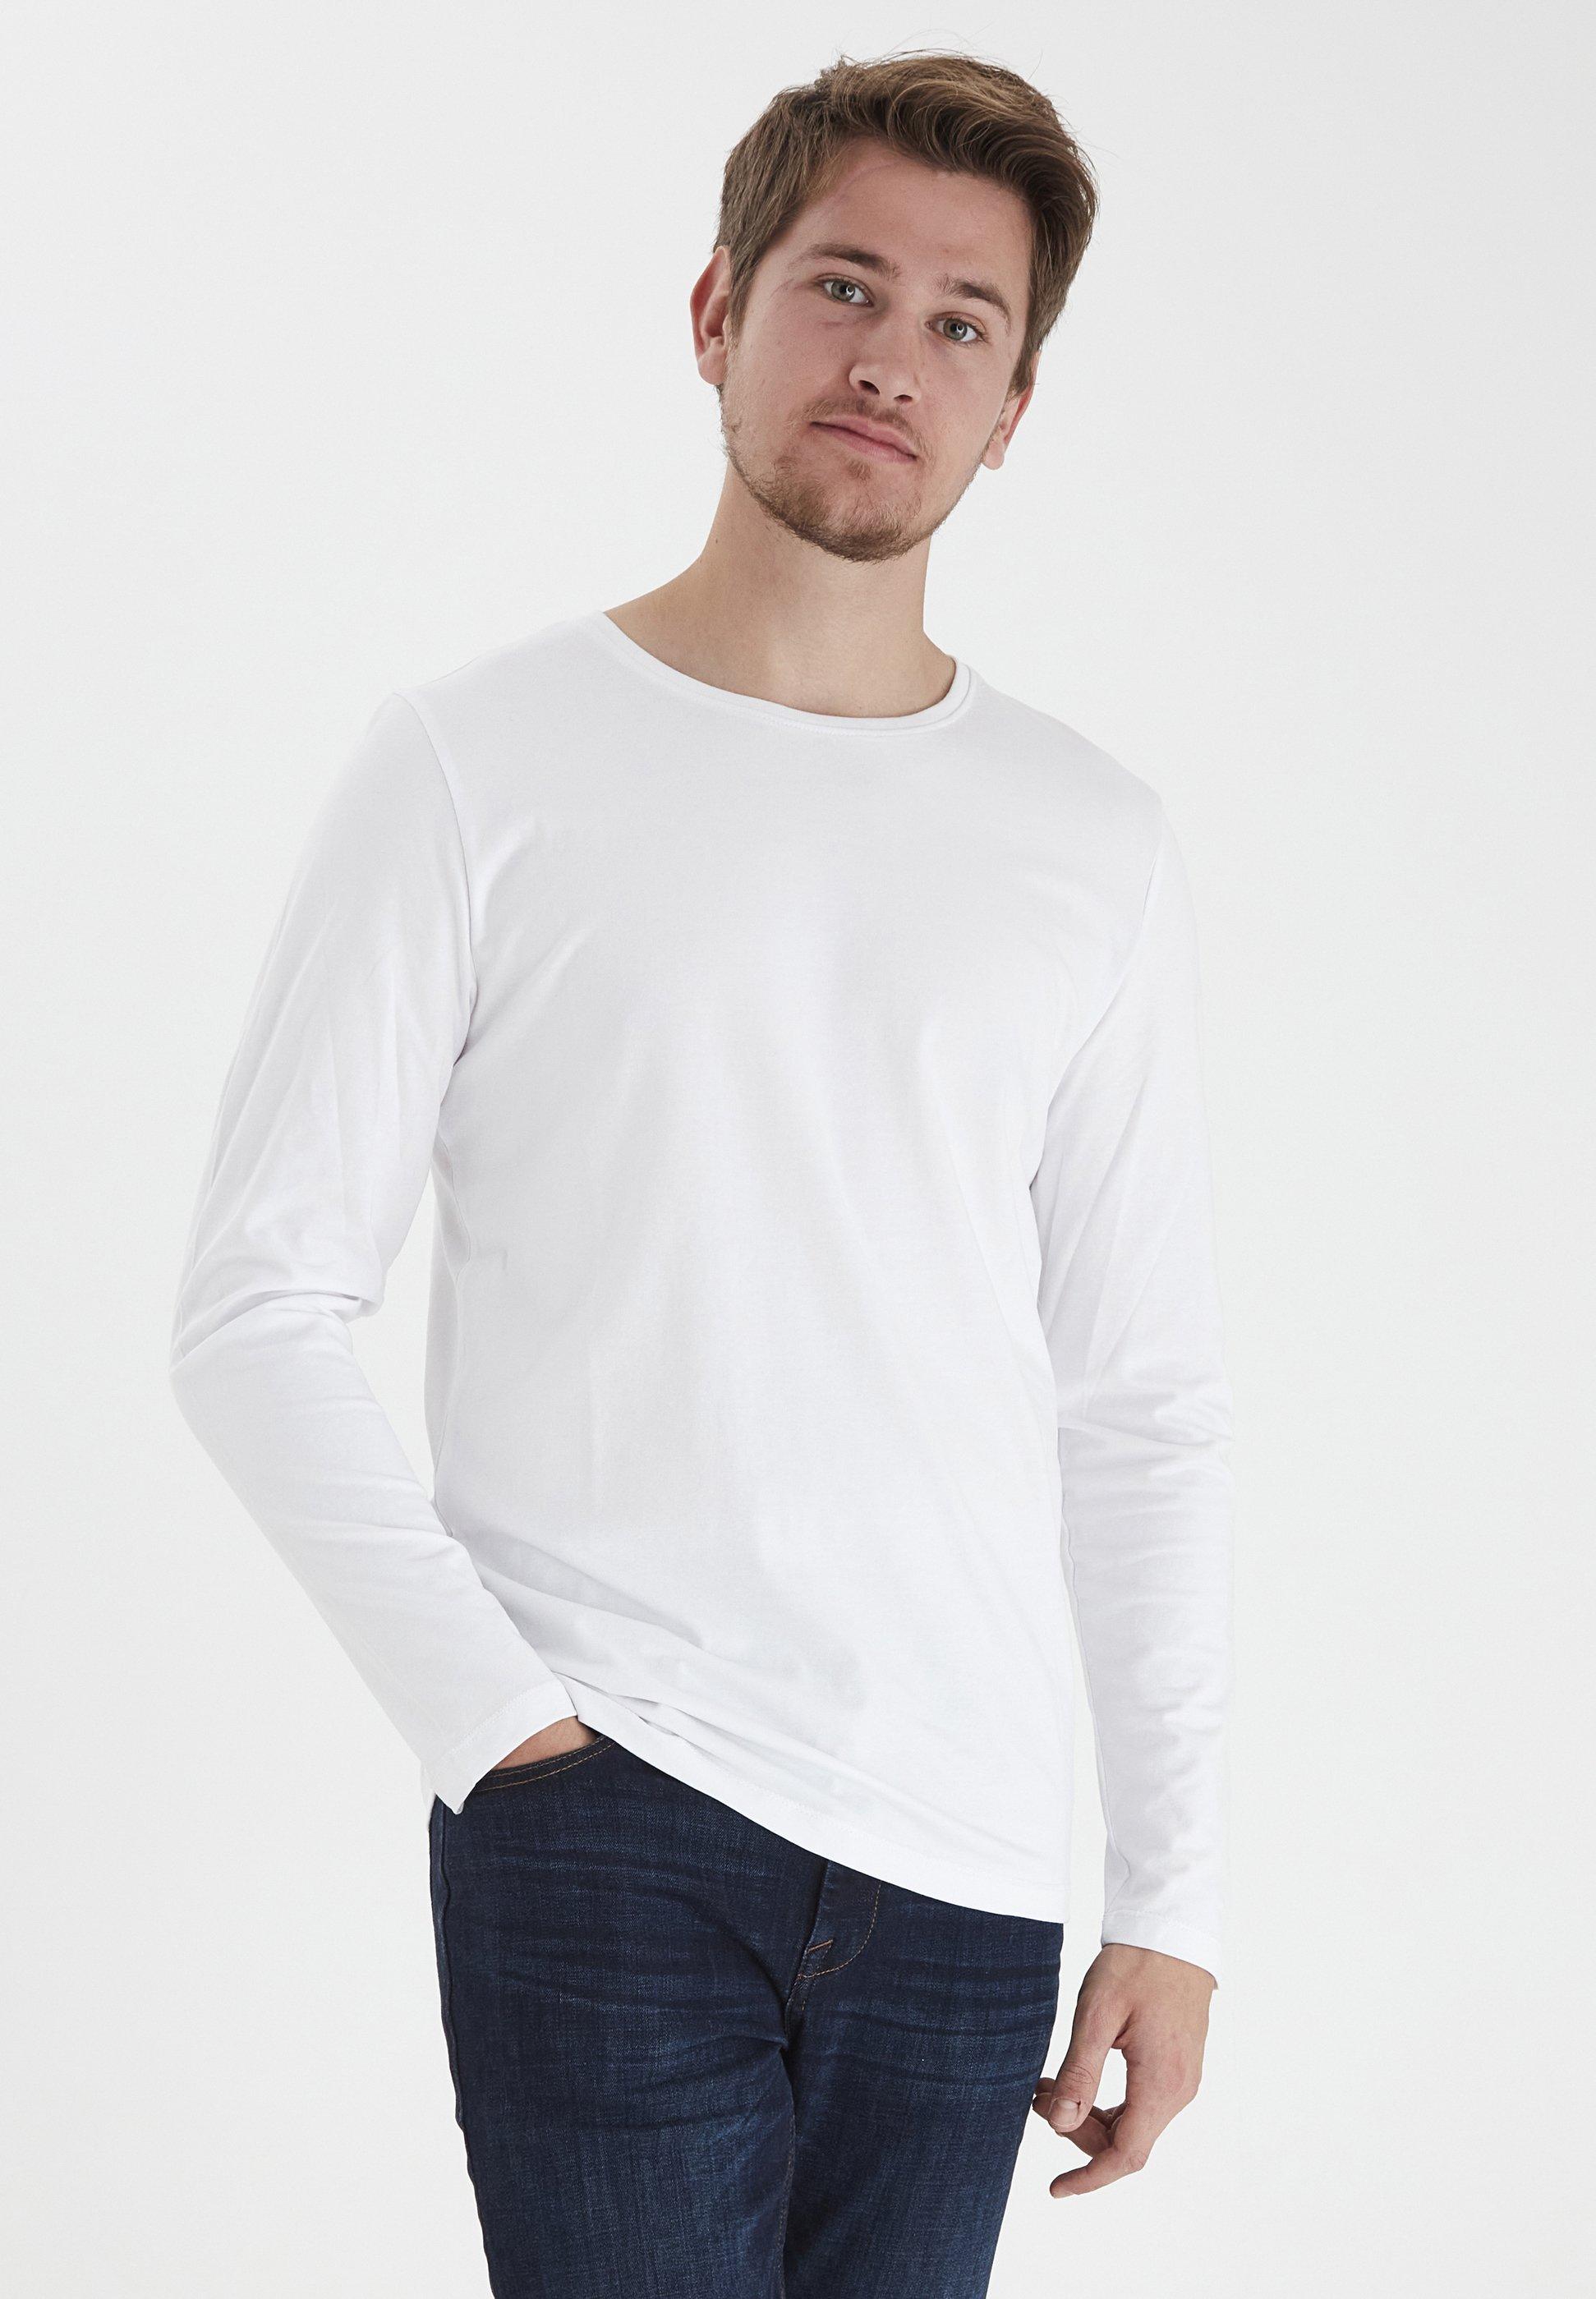 Uomo THEO LS  - Maglietta a manica lunga